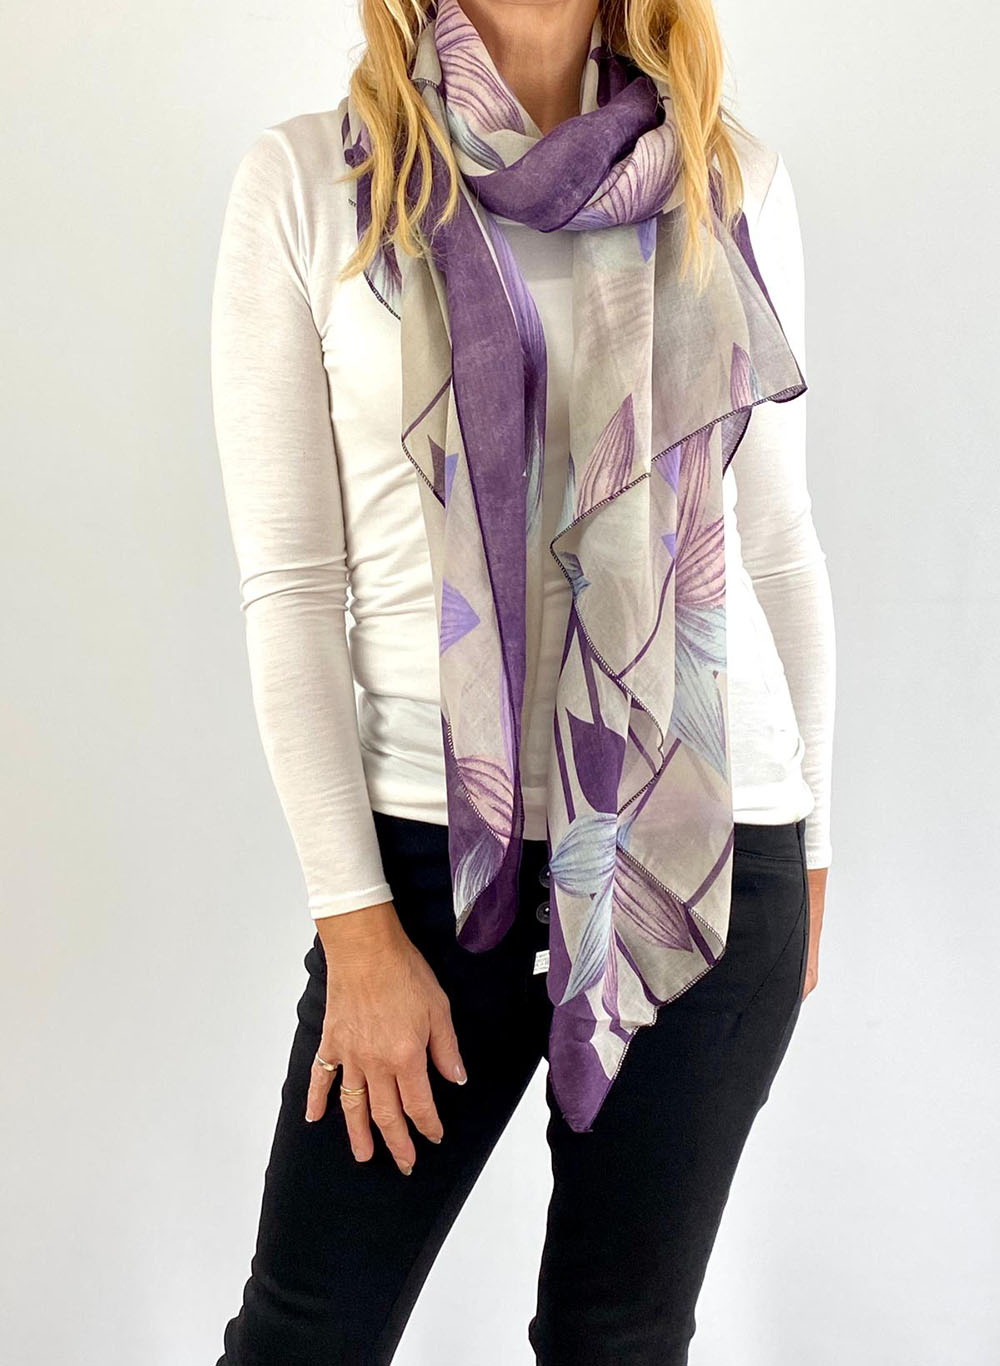 Purple and white scrafe Main